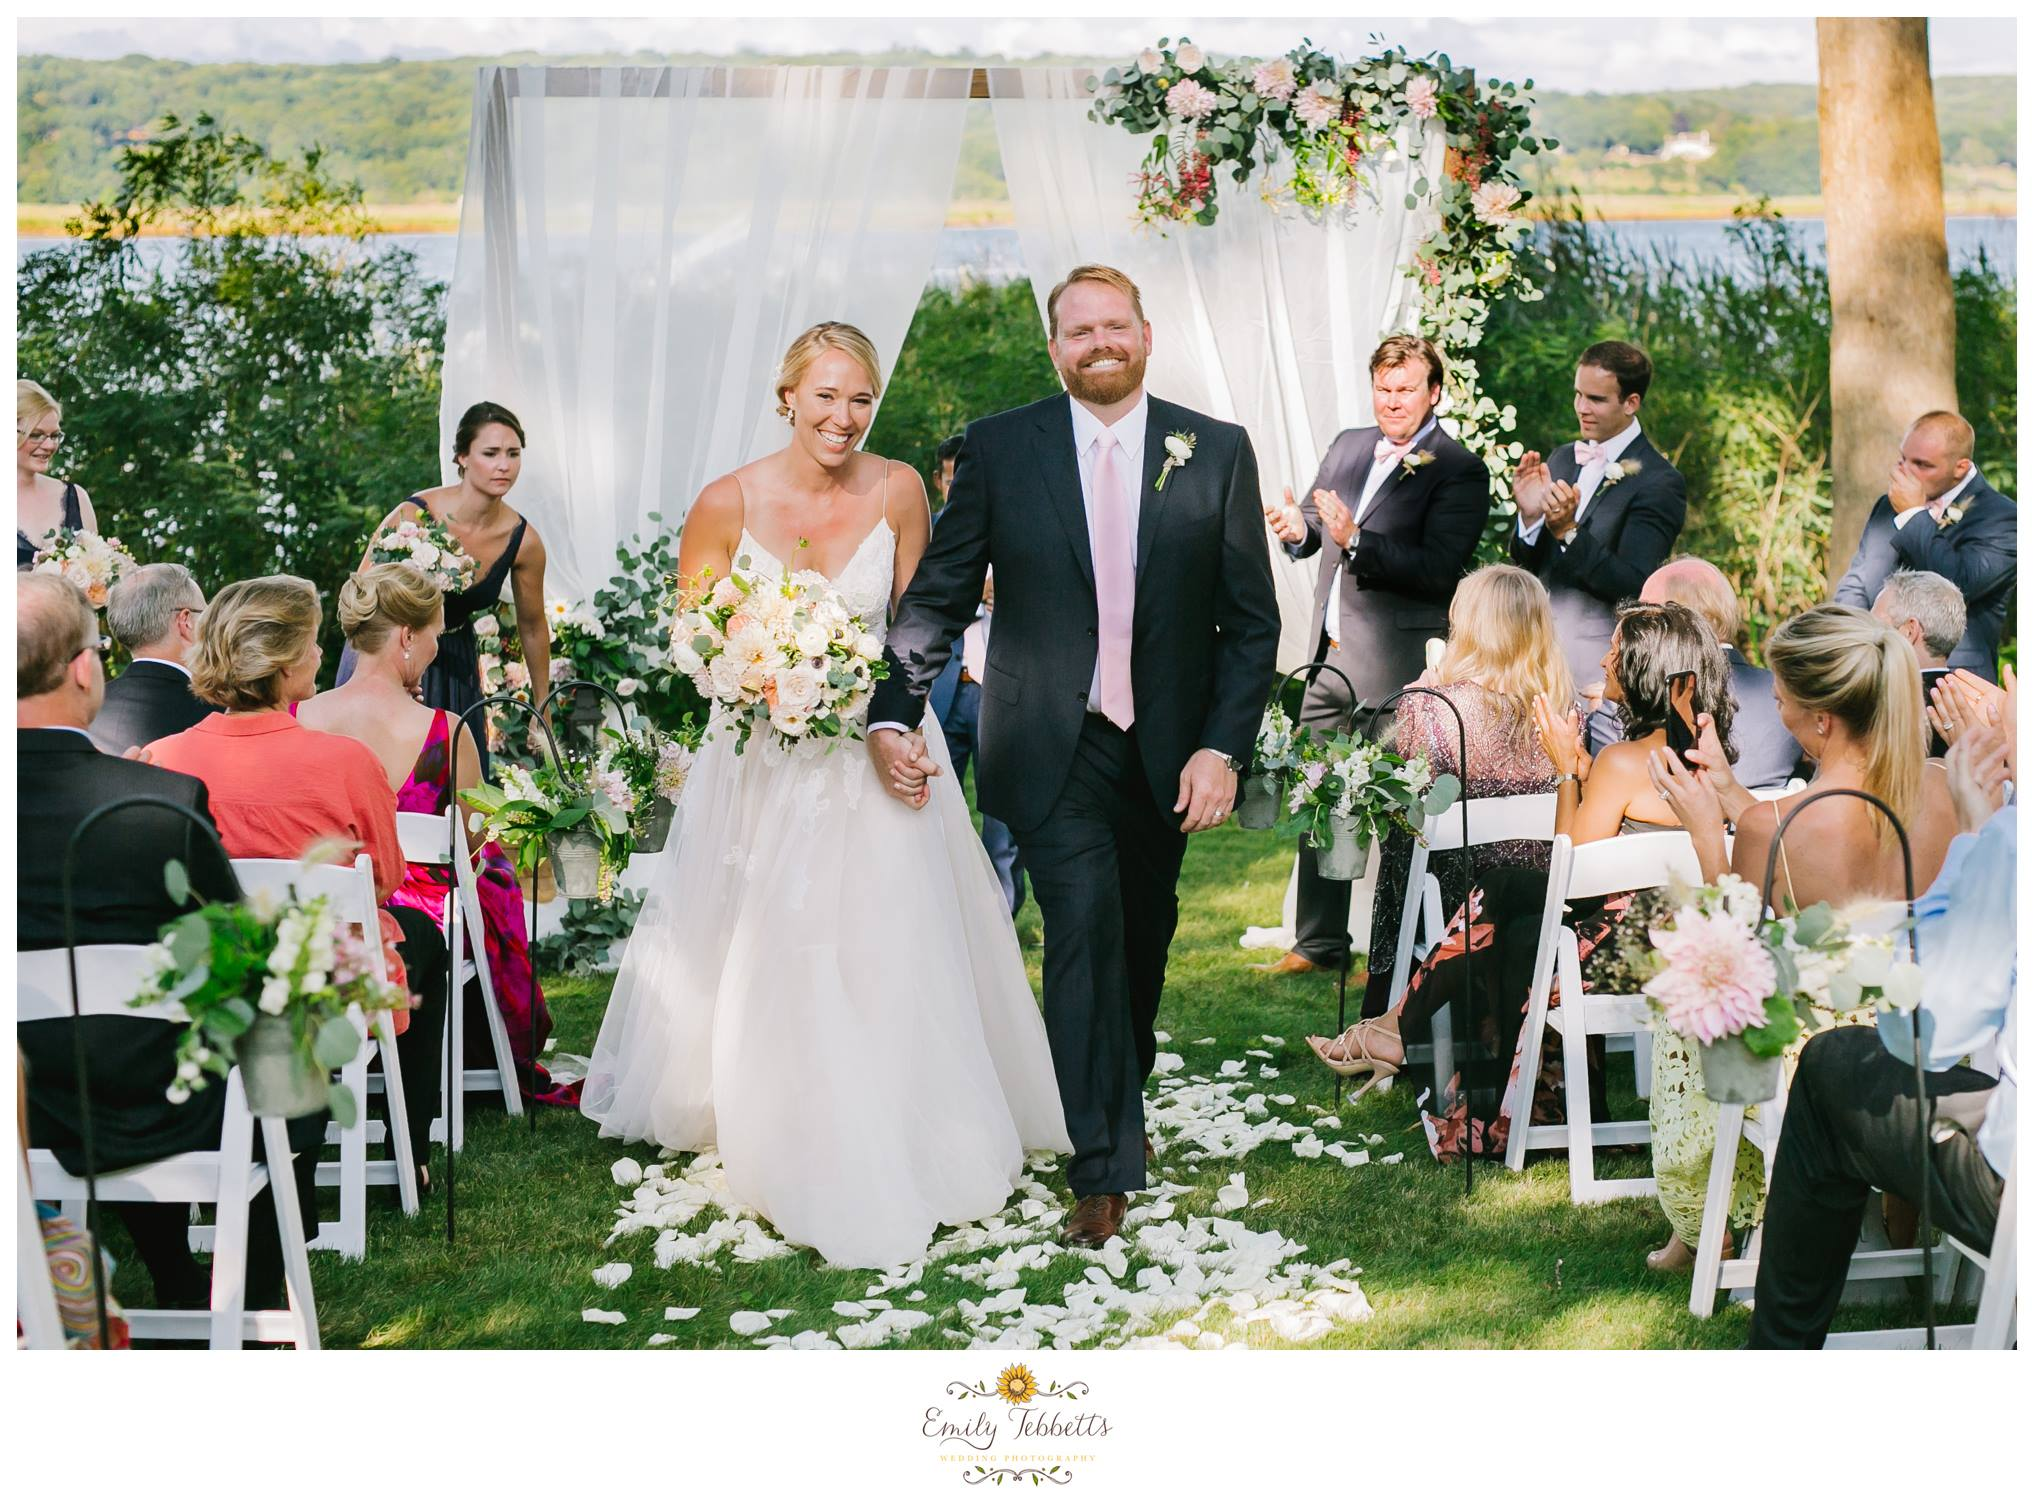 Emily Tebbetts Photography Wedding || Private Residence : Dauntless Club, Essex, CT 2.jpg